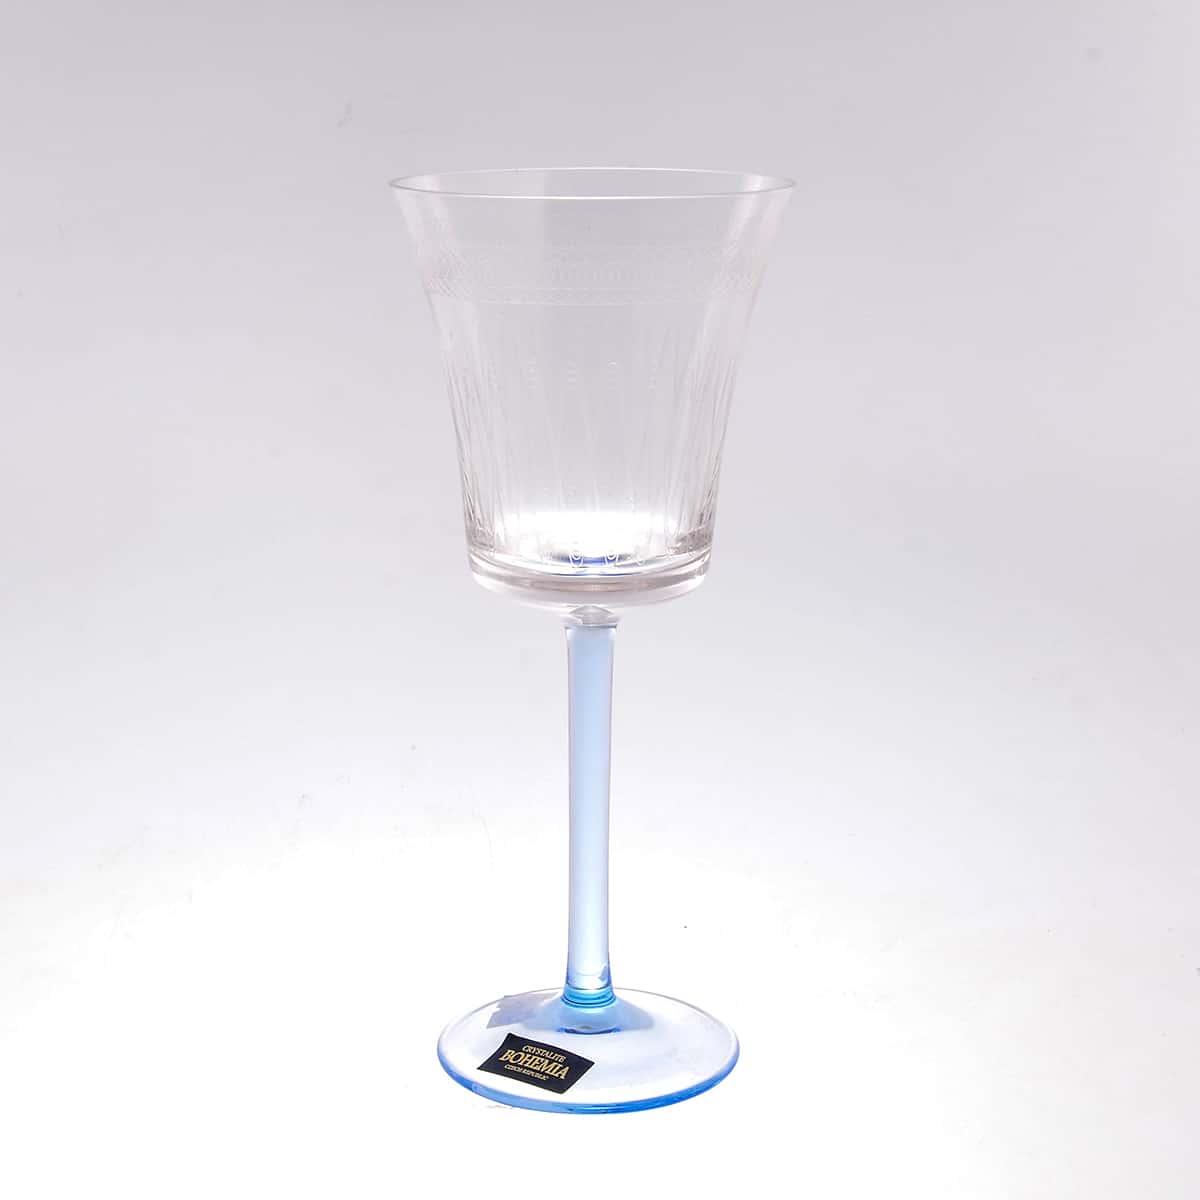 ANNABELL 280560 Набор бокалов для вина 240 мл Crystalite (6 шт)